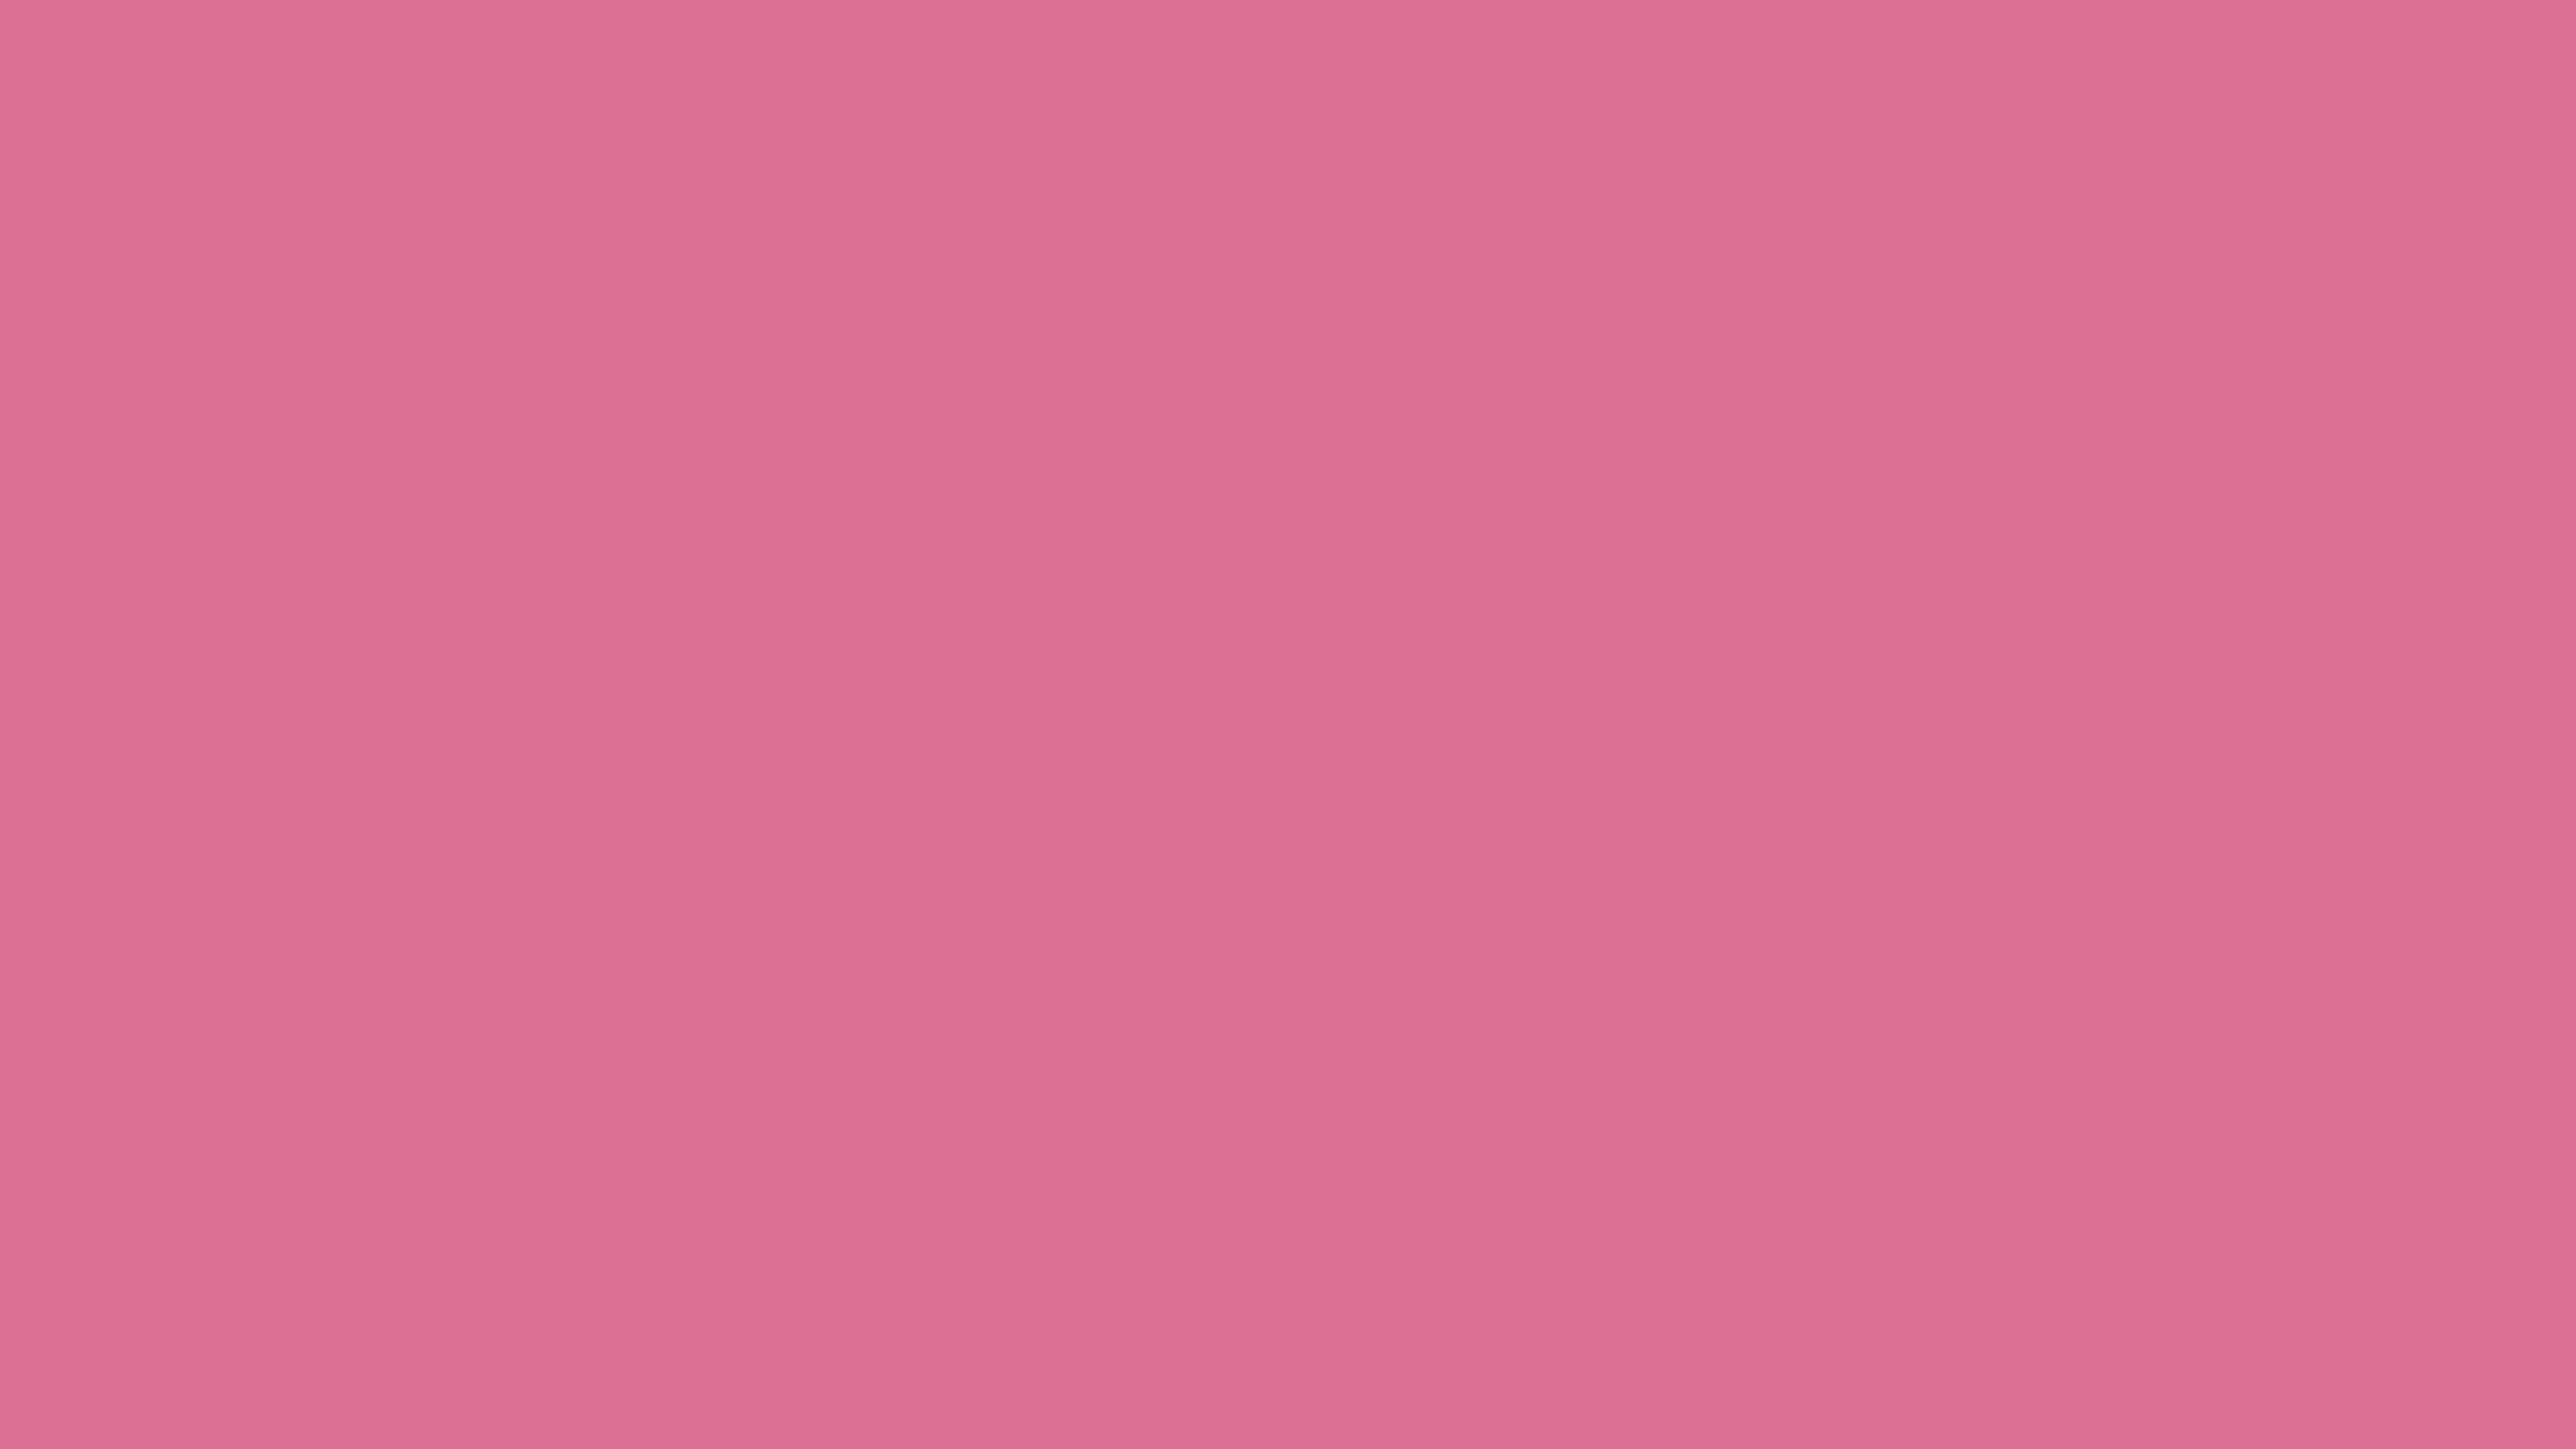 4096x2304 Pale Violet-red Solid Color Background